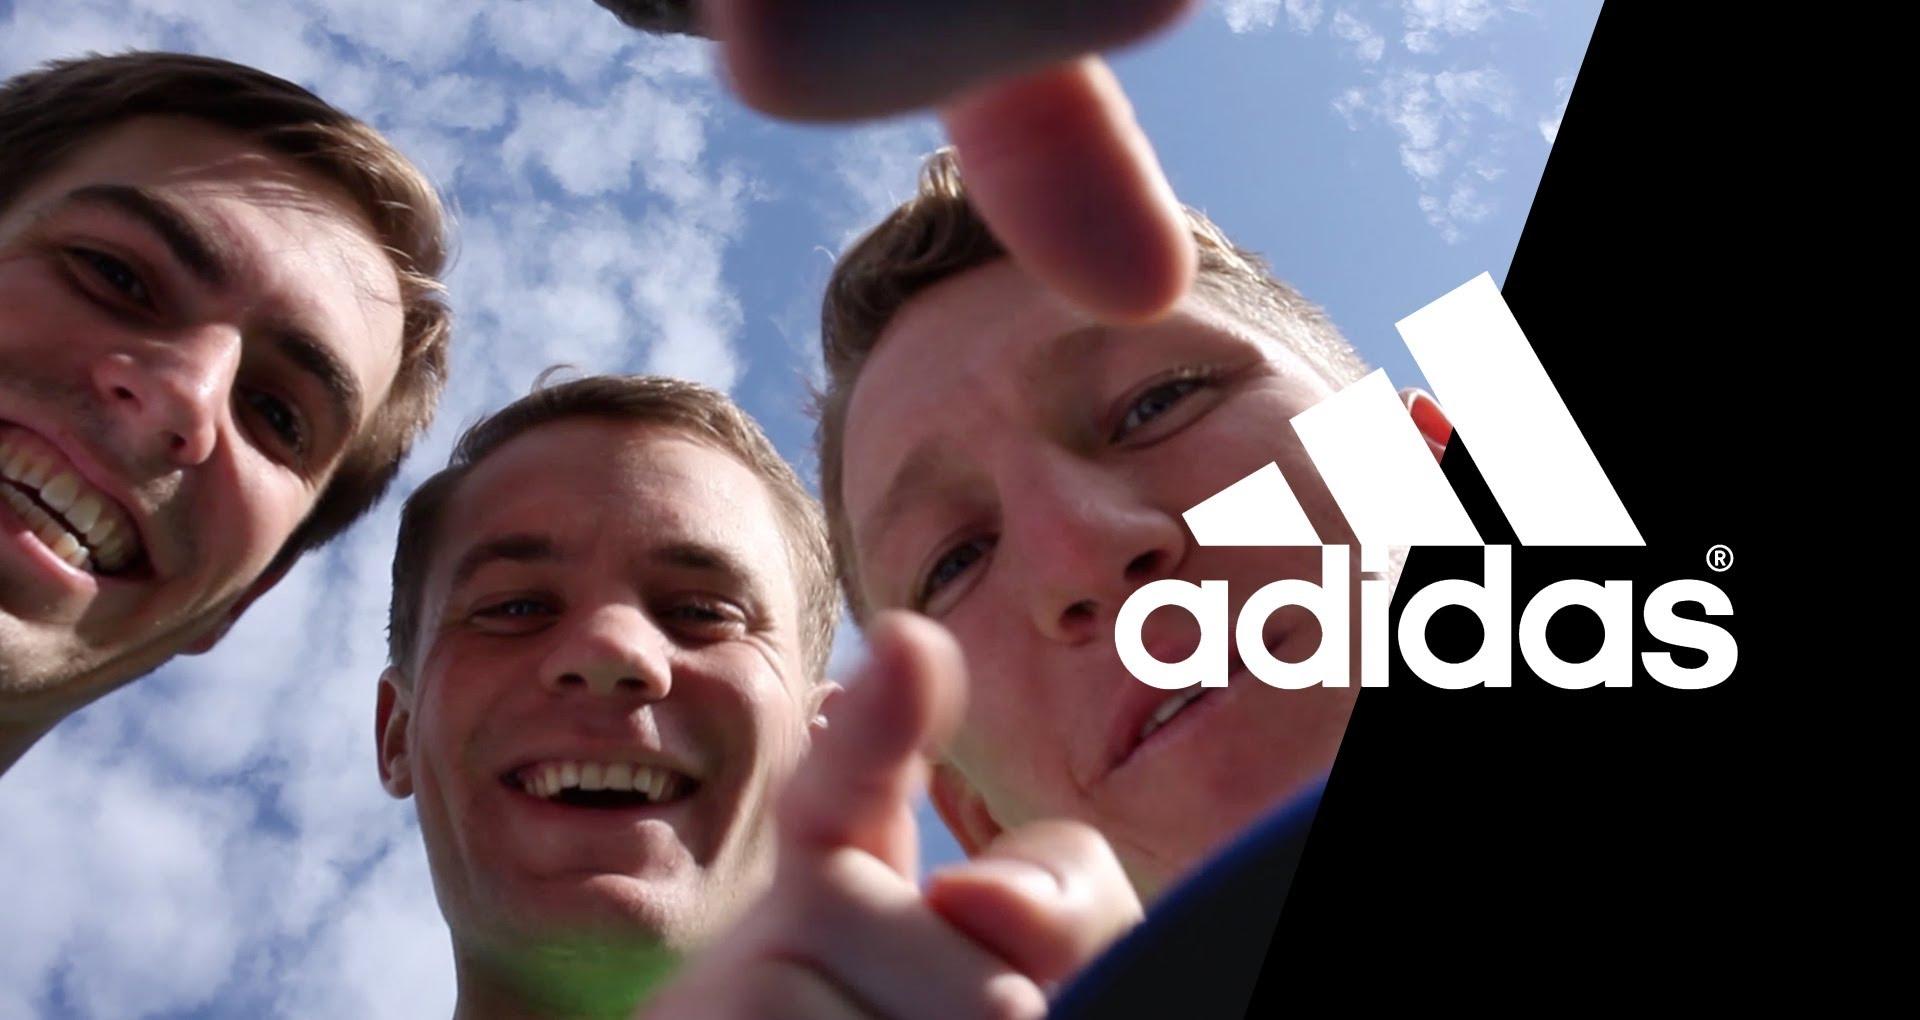 adidas brazucam kamera ball mit